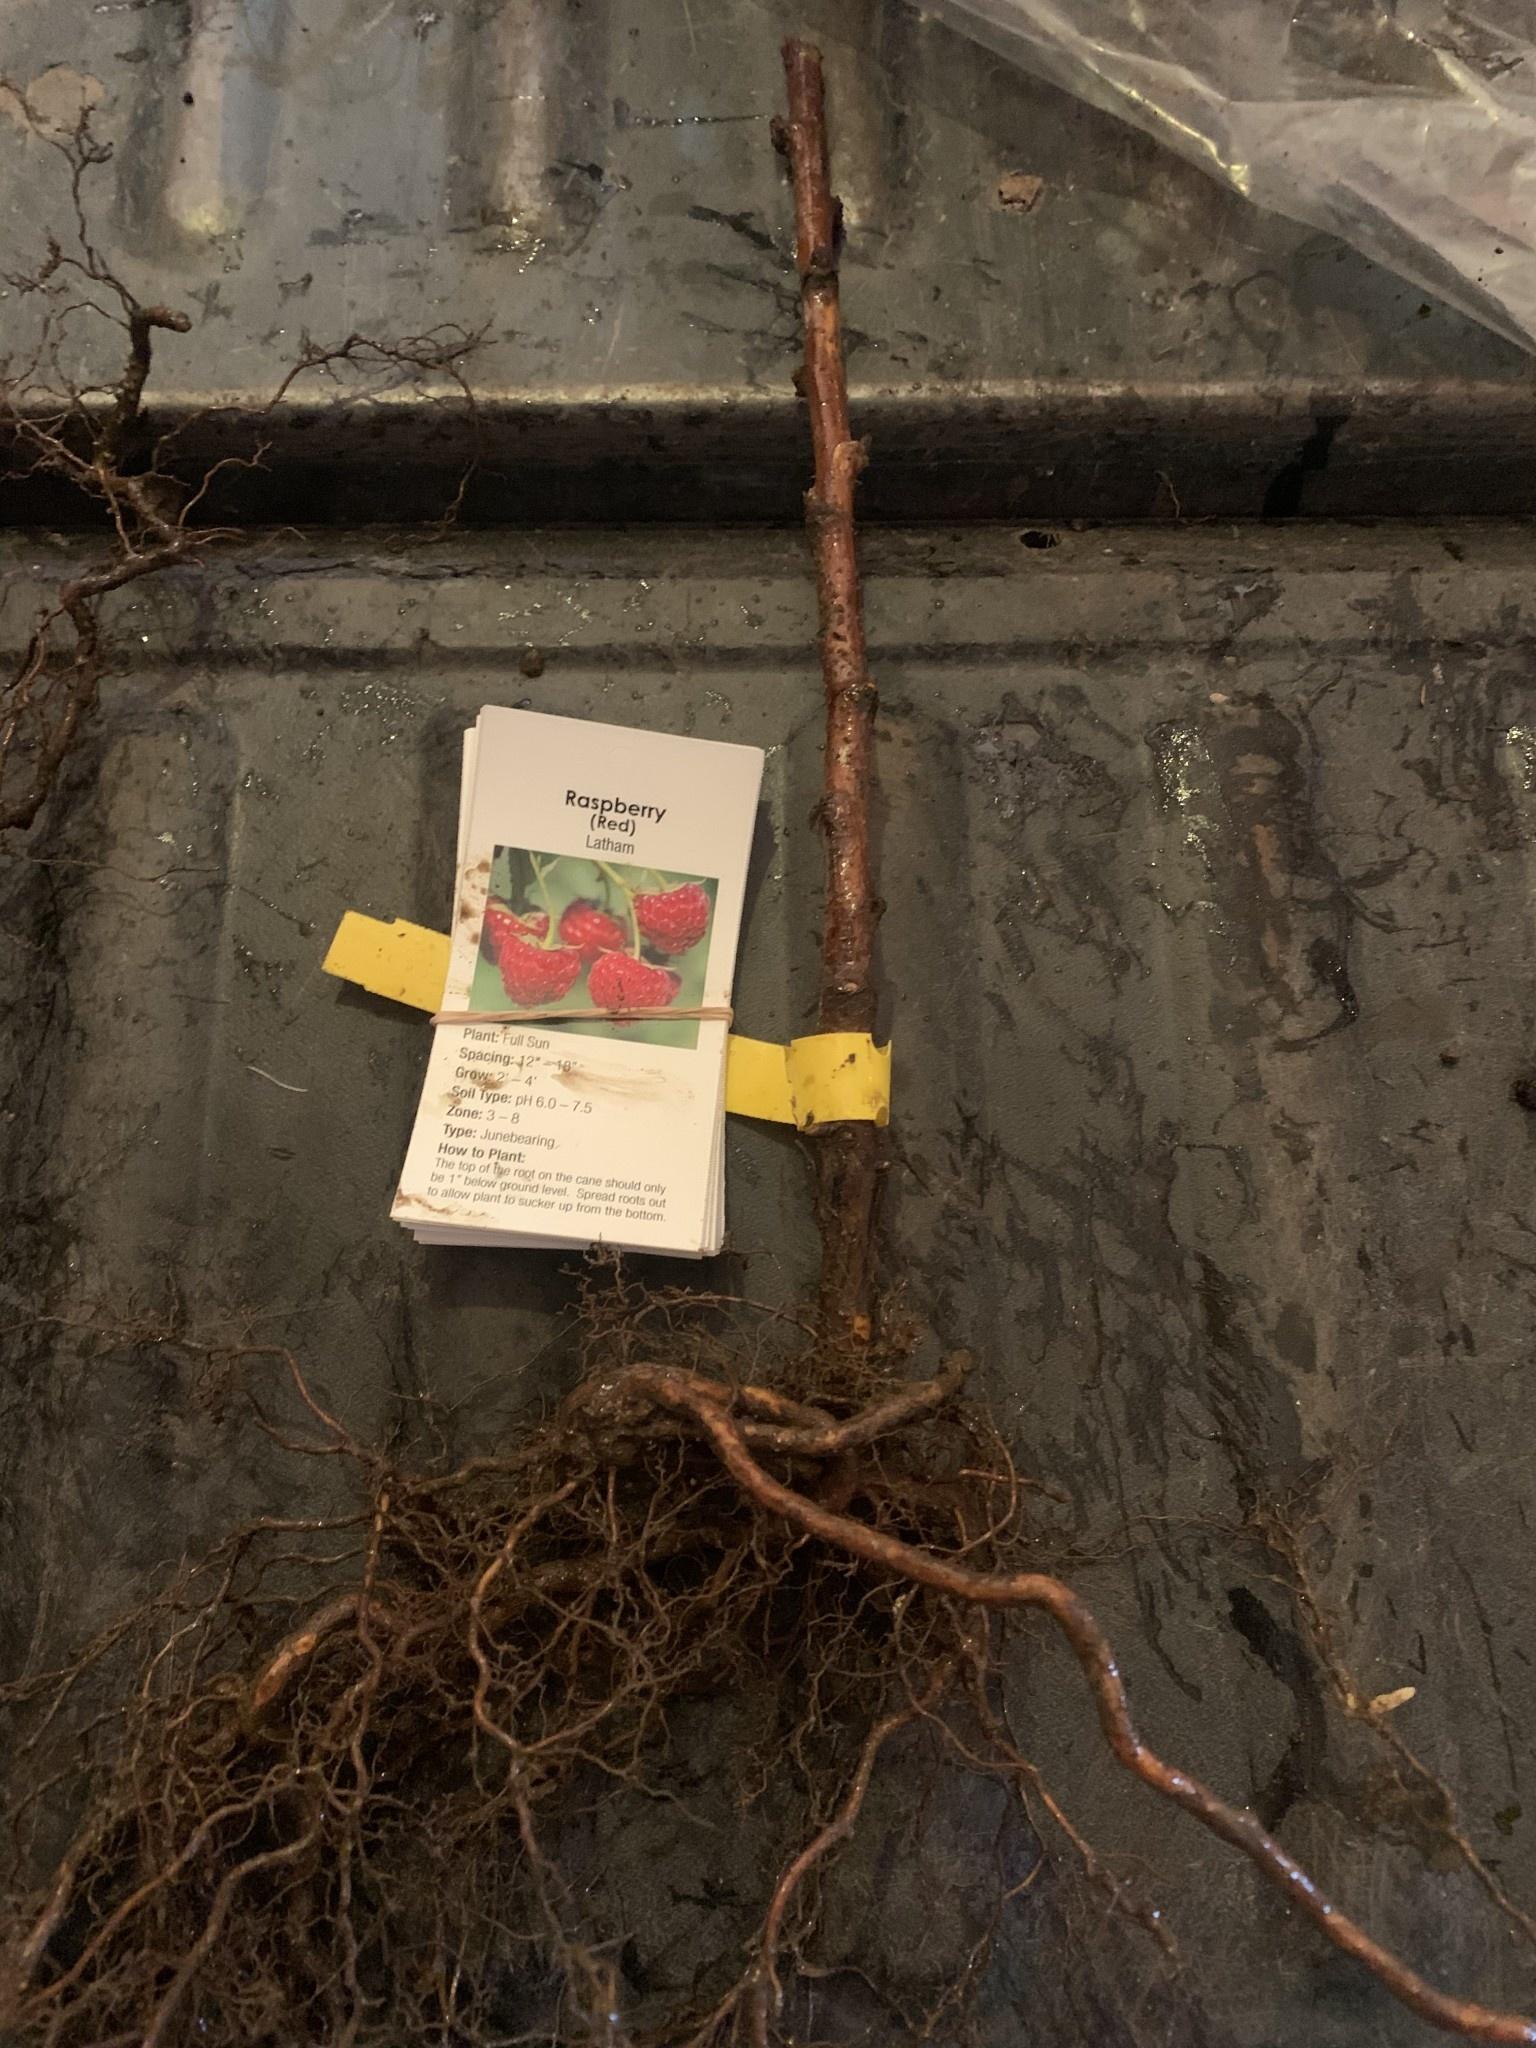 Rubus New Logan Black Raspberry, New Logan,